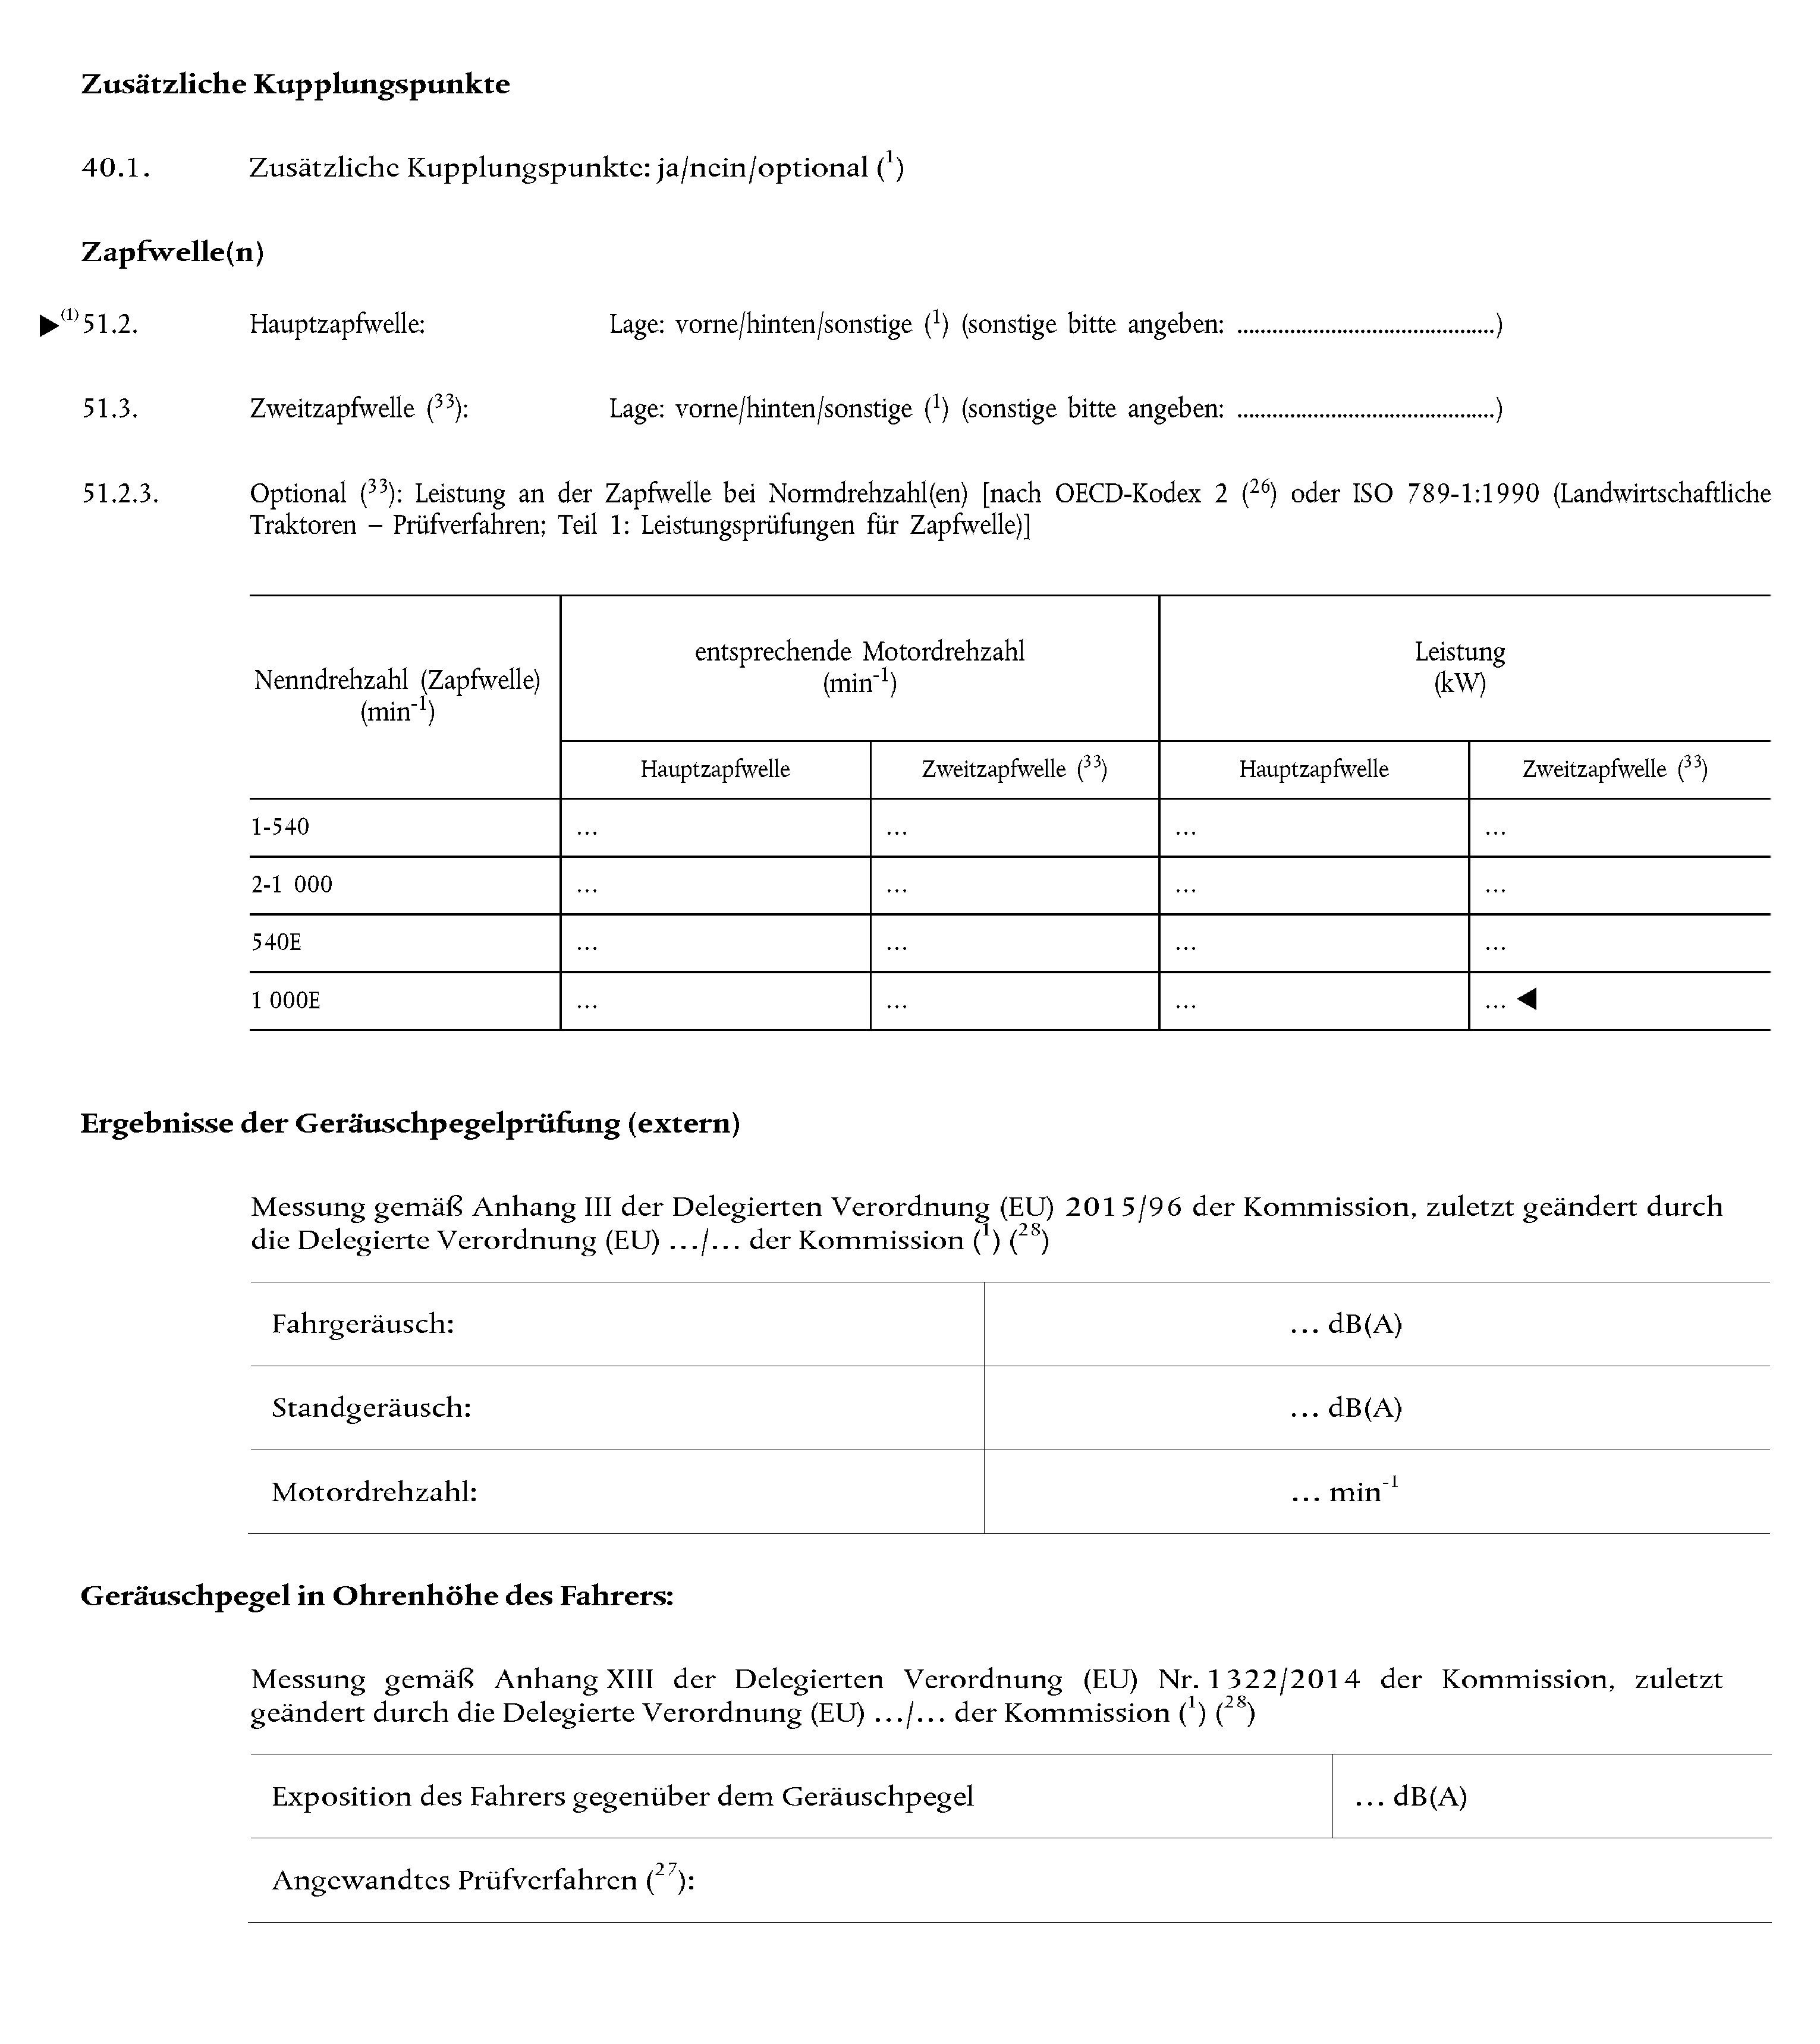 EUR-Lex - 02015R0504-20180215 - EN - EUR-Lex